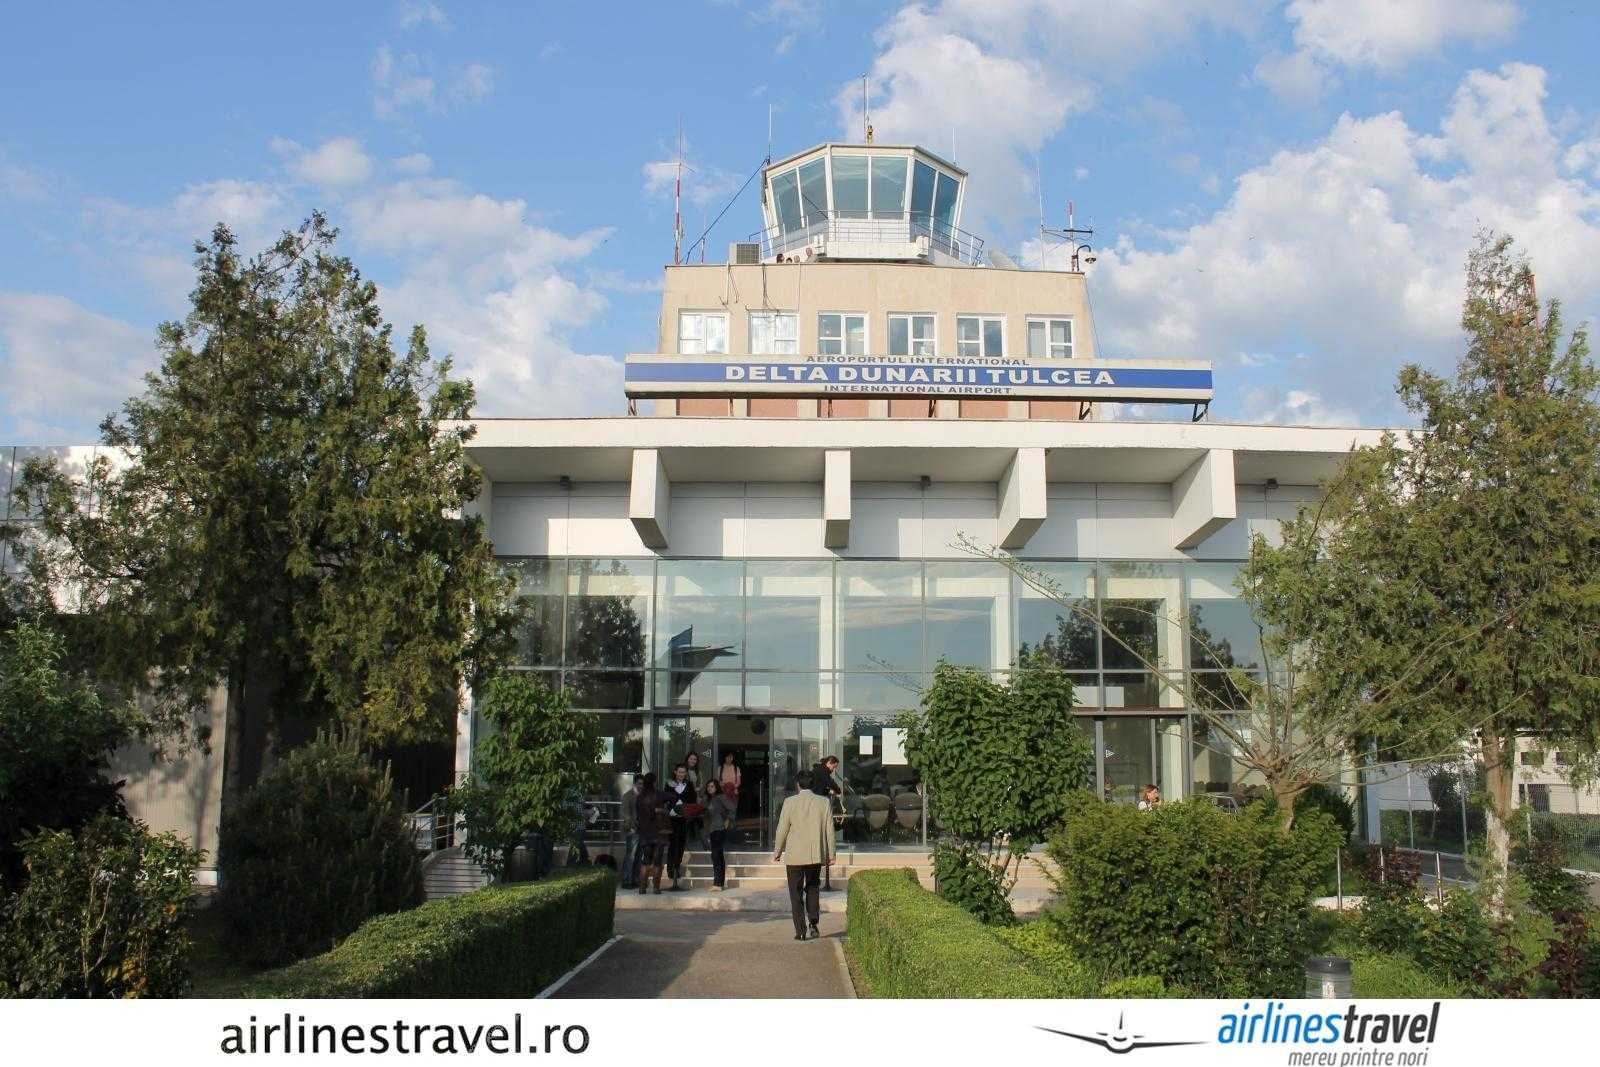 Aeroport Delta Dunarii Tulcea